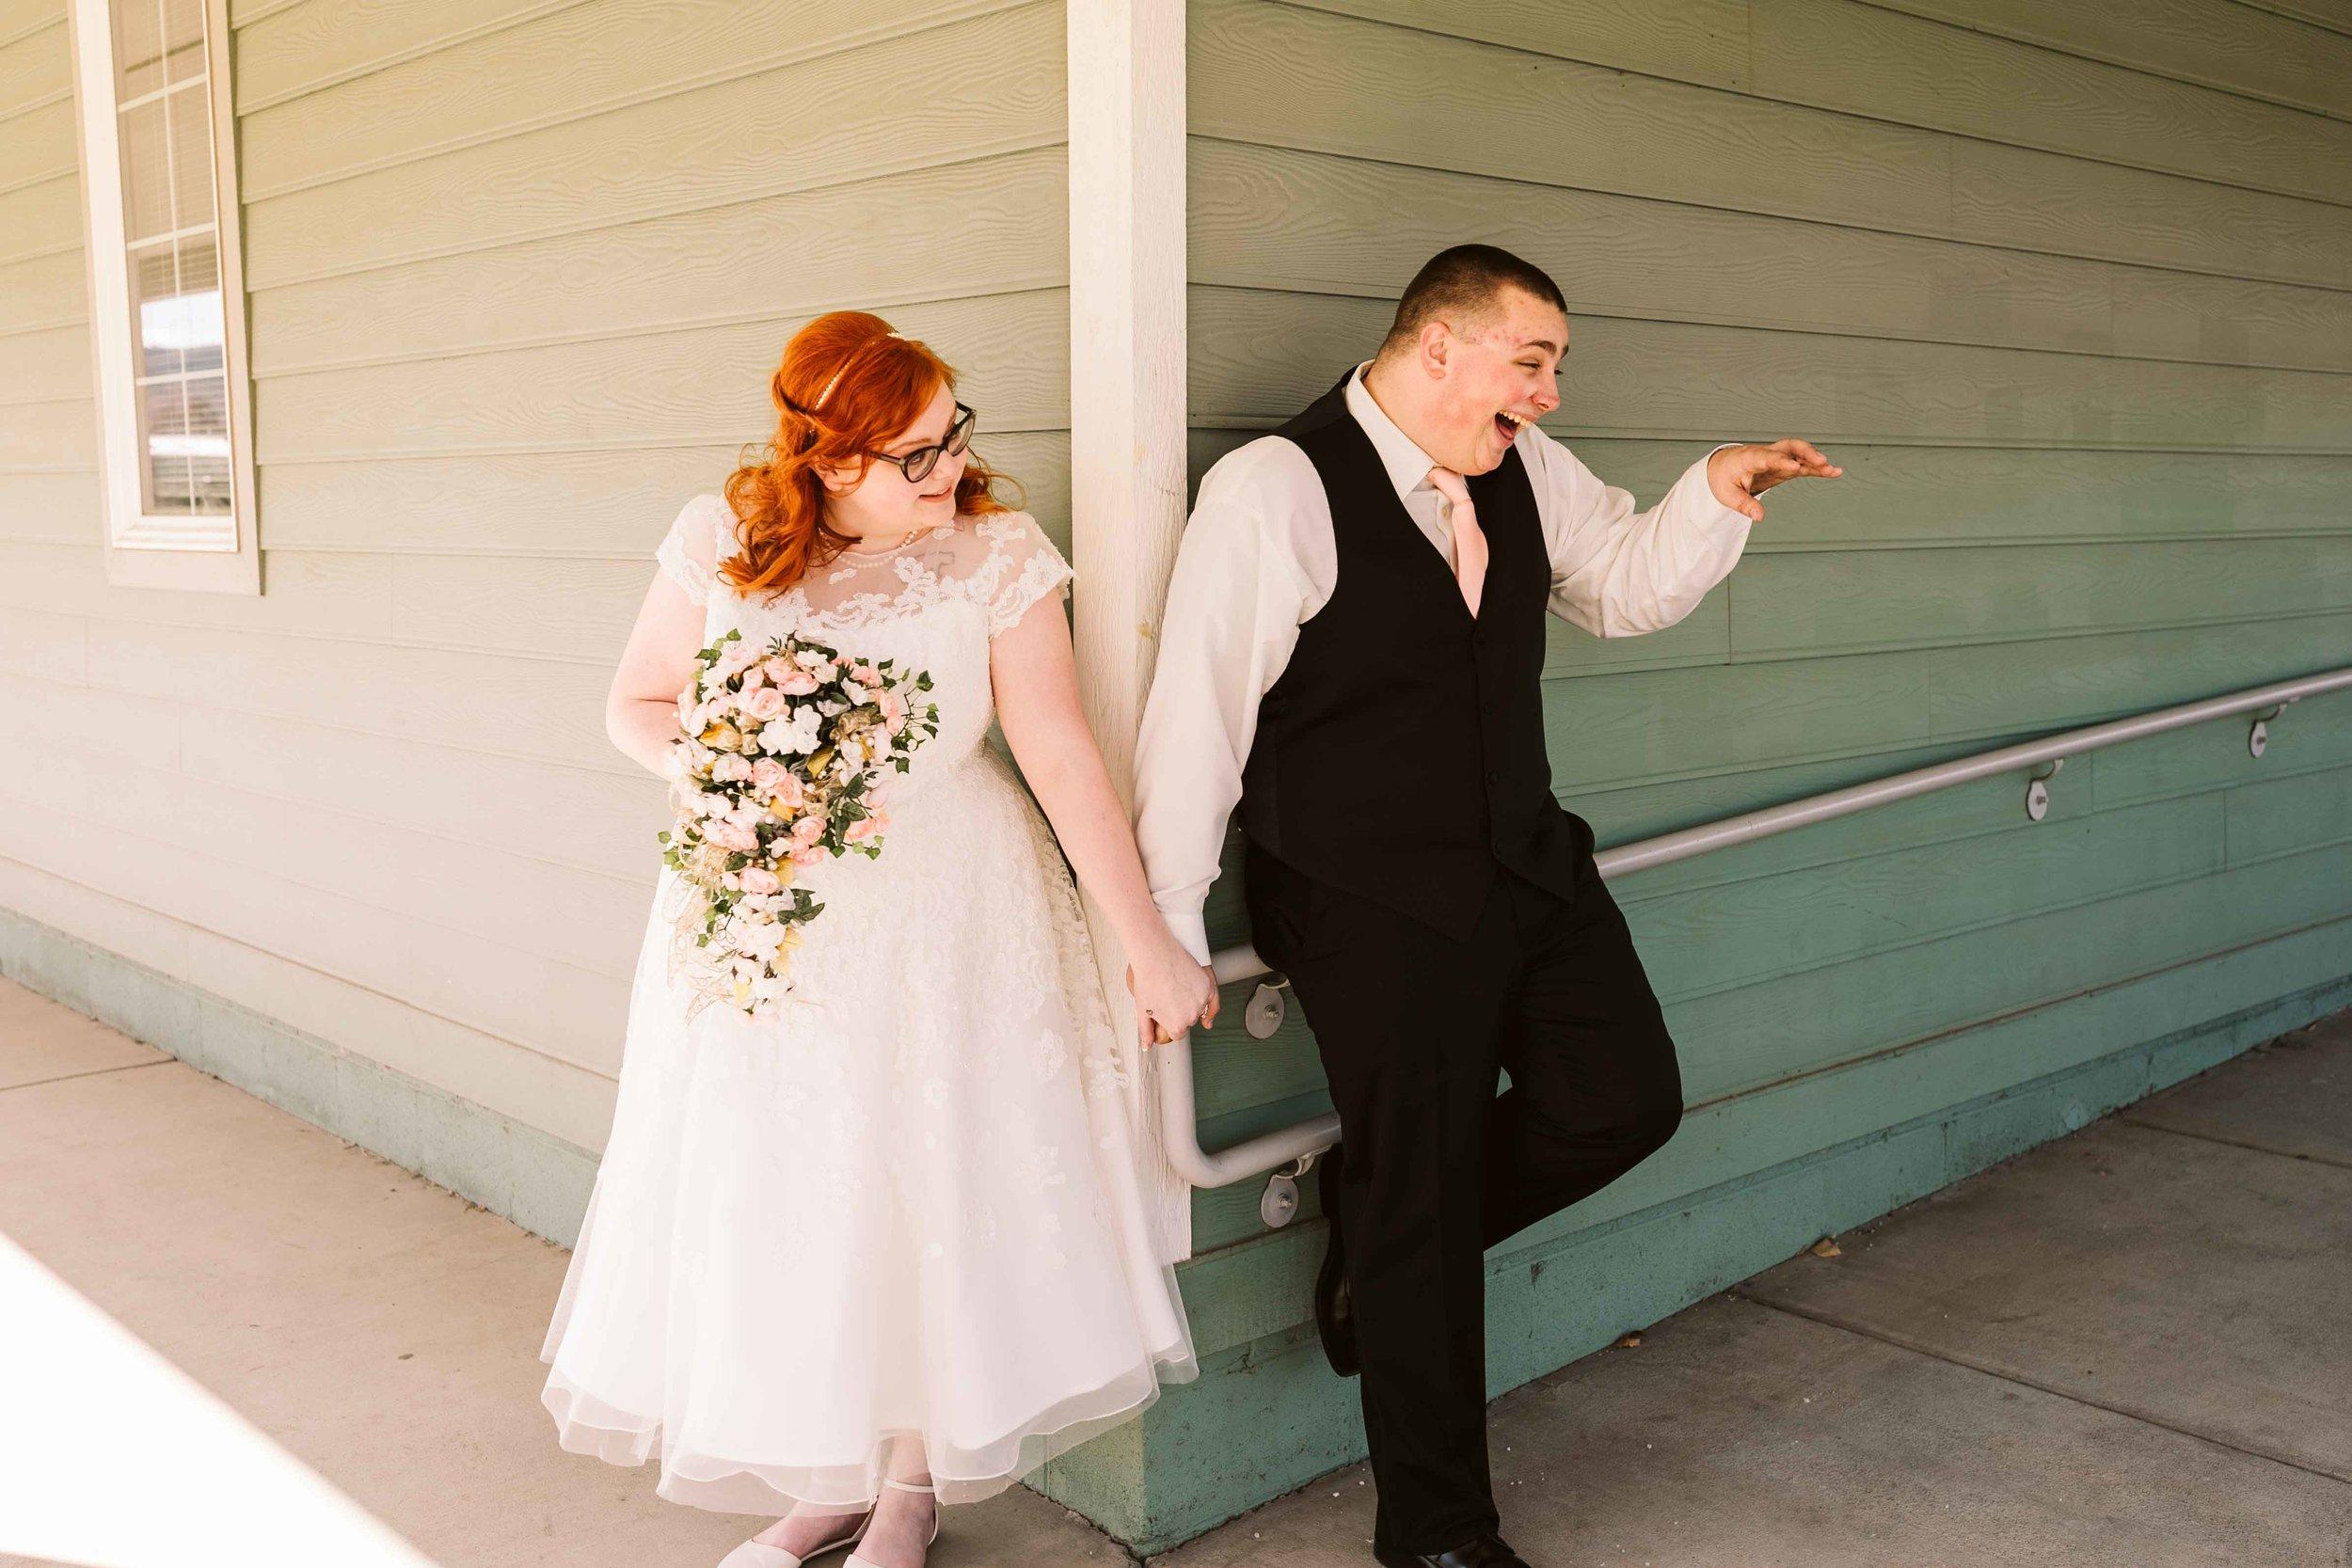 richland-wedding-photographer-53.jpg